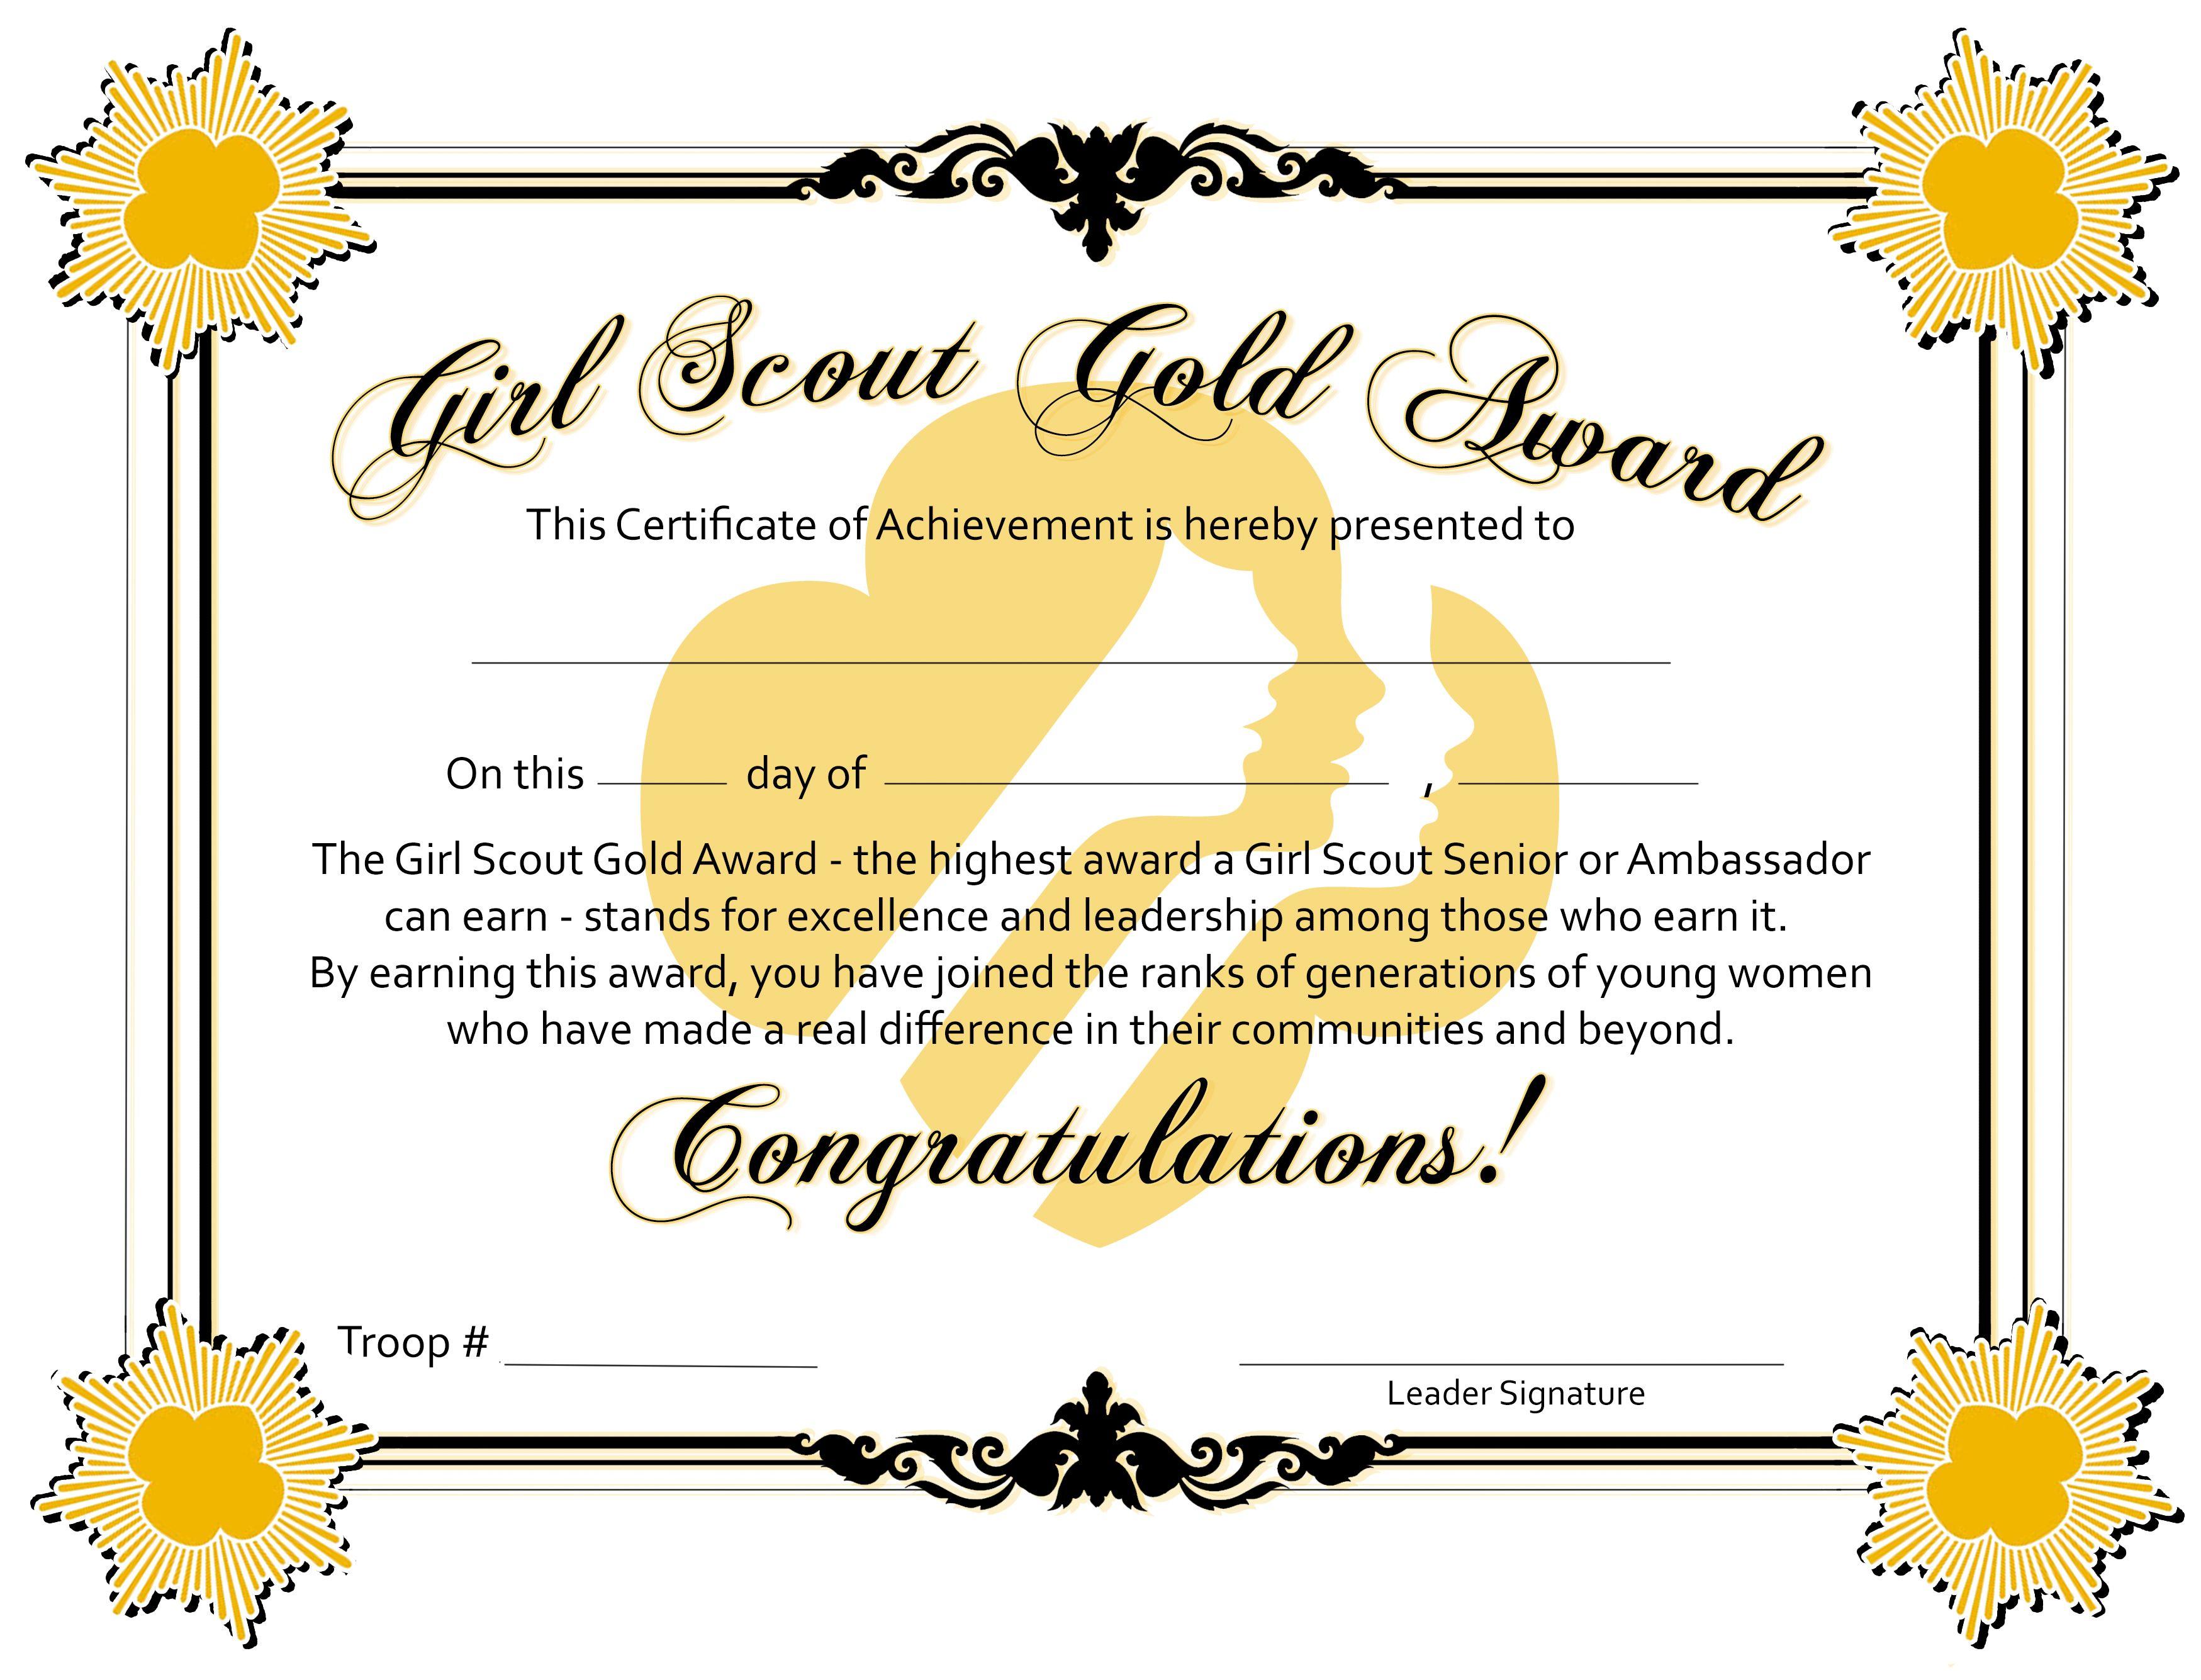 Gold award certificate template gallery certificate design and gold award certificate of achievement girl scout certificates gold award certificate of achievement yadclub gallery yadclub Images